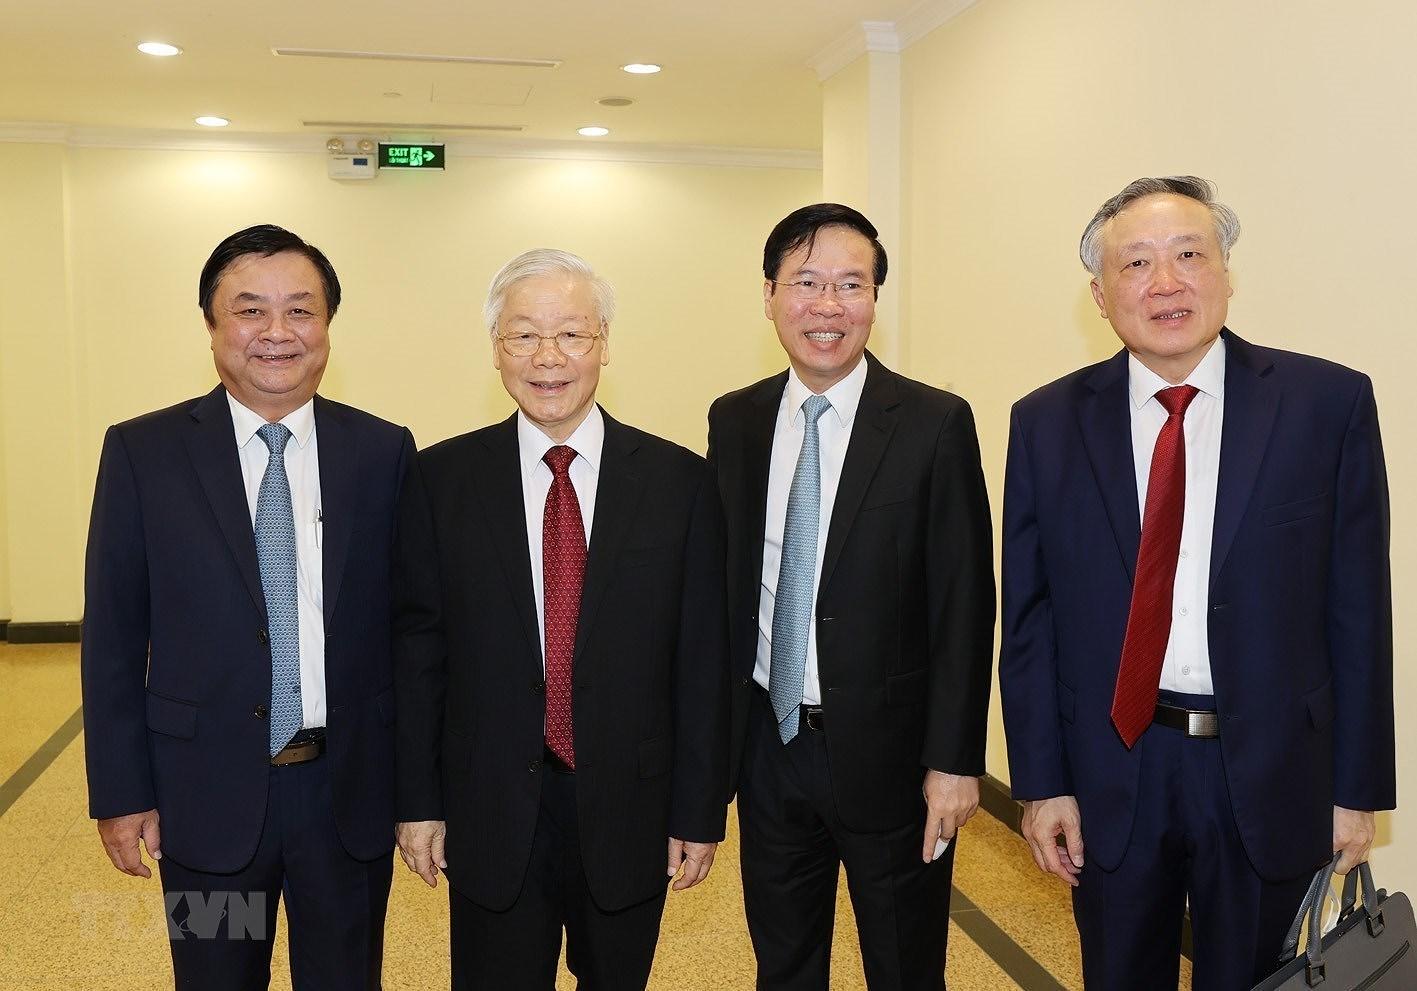 Hinh anh khai mac Hoi nghi lan thu ba Ban Chap hanh TW Dang khoa XIII hinh anh 3